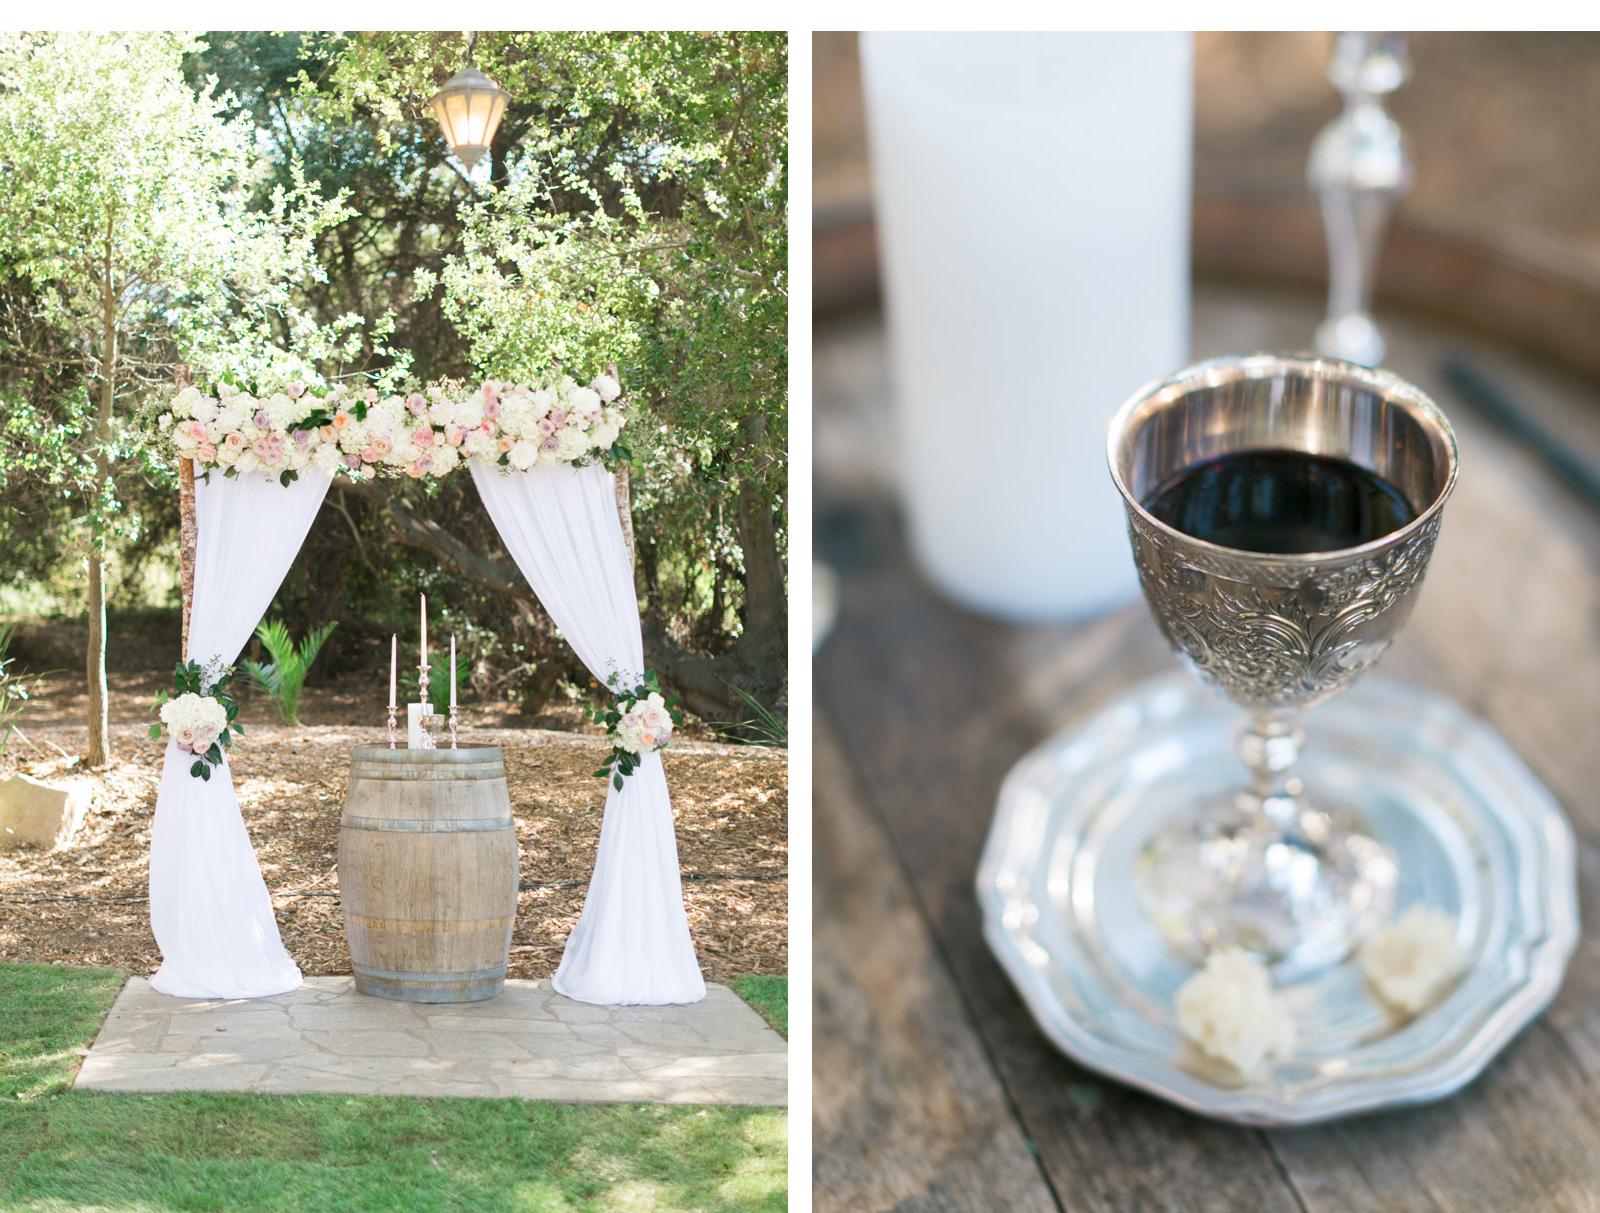 Nia-Sanchez-Southern-California-Wedding-Natalie-Schutt-Photography_06.jpg